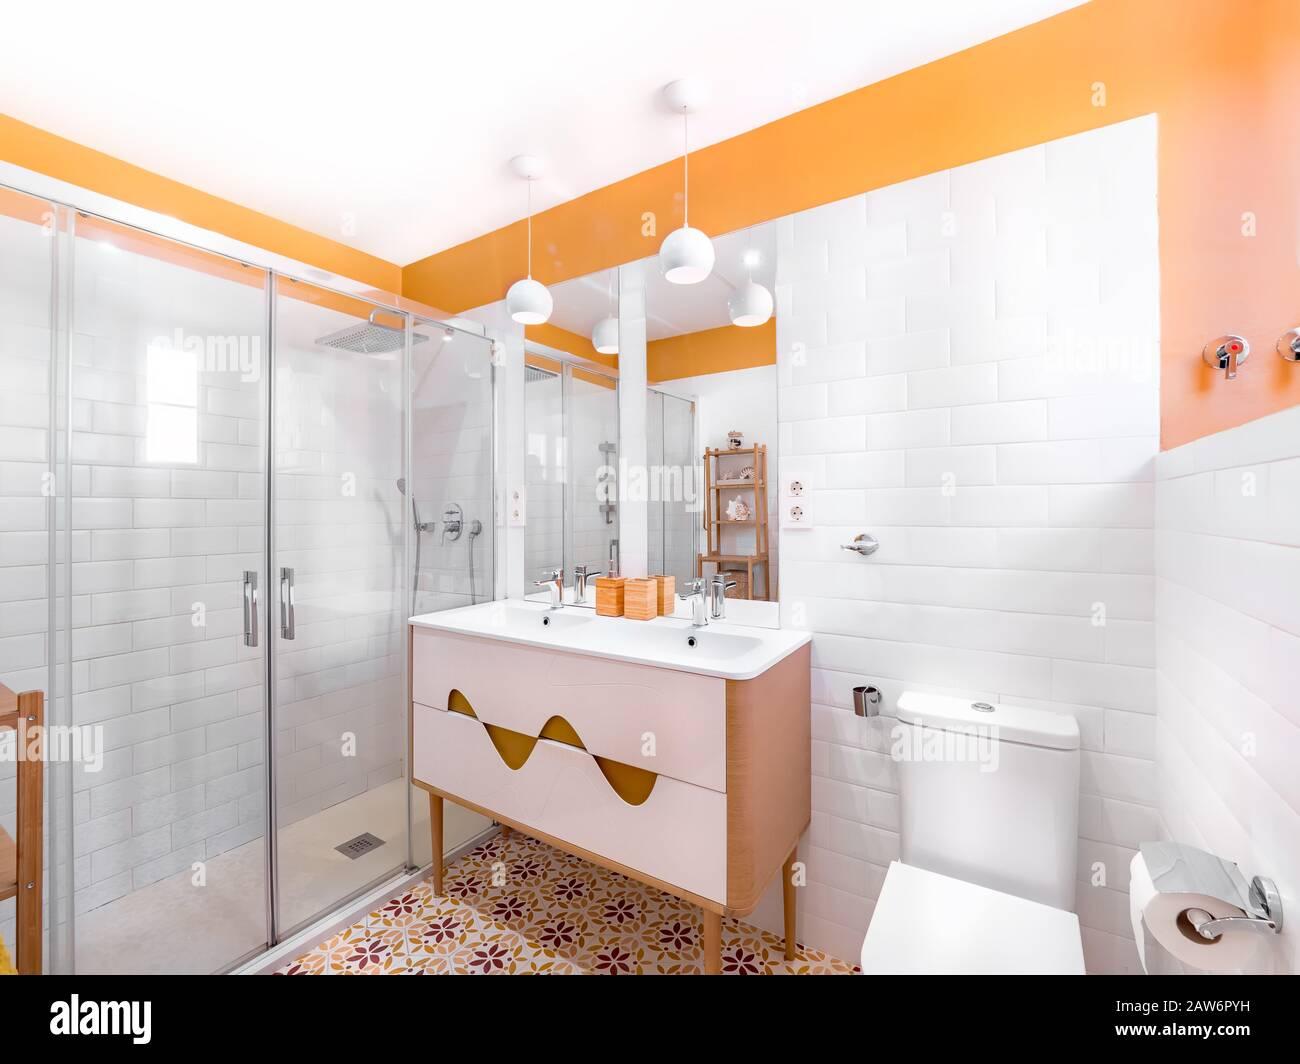 Frise Salle De Bain Horizontale Ou Verticale 1970s bathroom stock photos & 1970s bathroom stock images